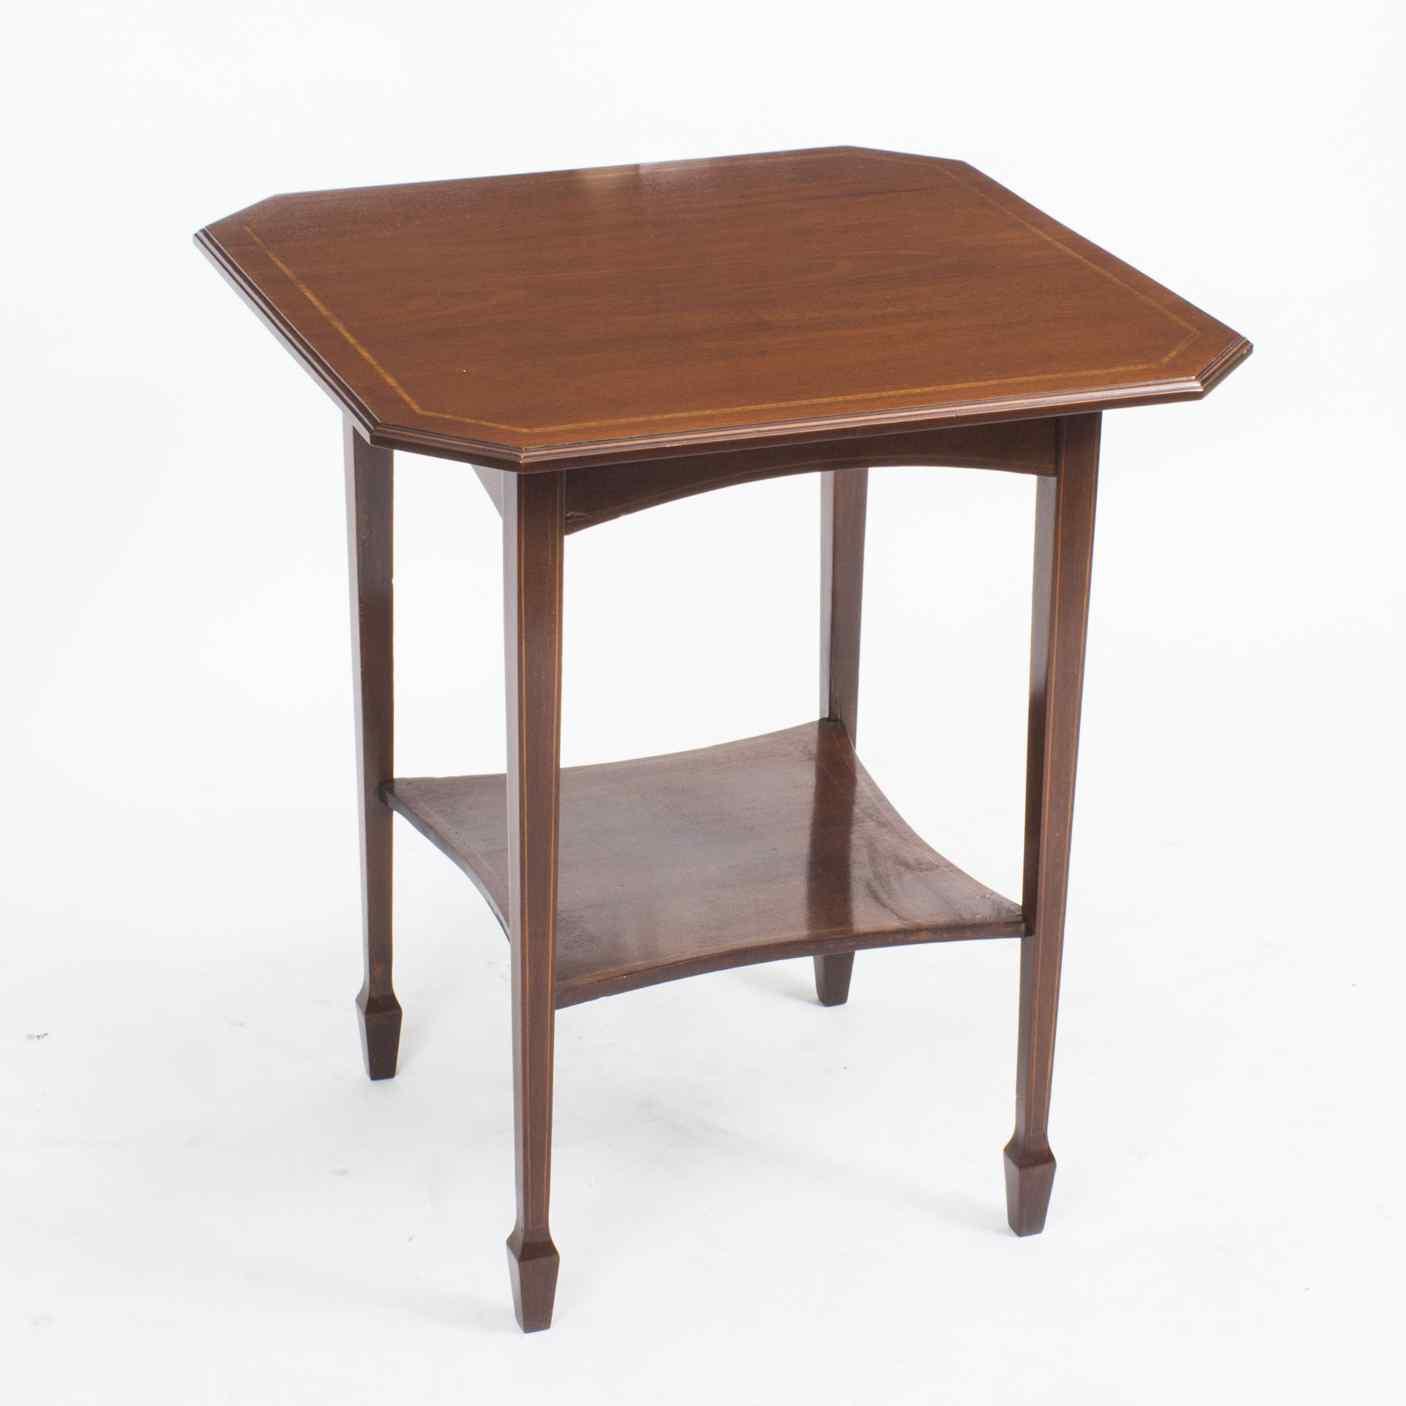 Antique Inlaid Mahogany Edwardian Occasional Table c.1900